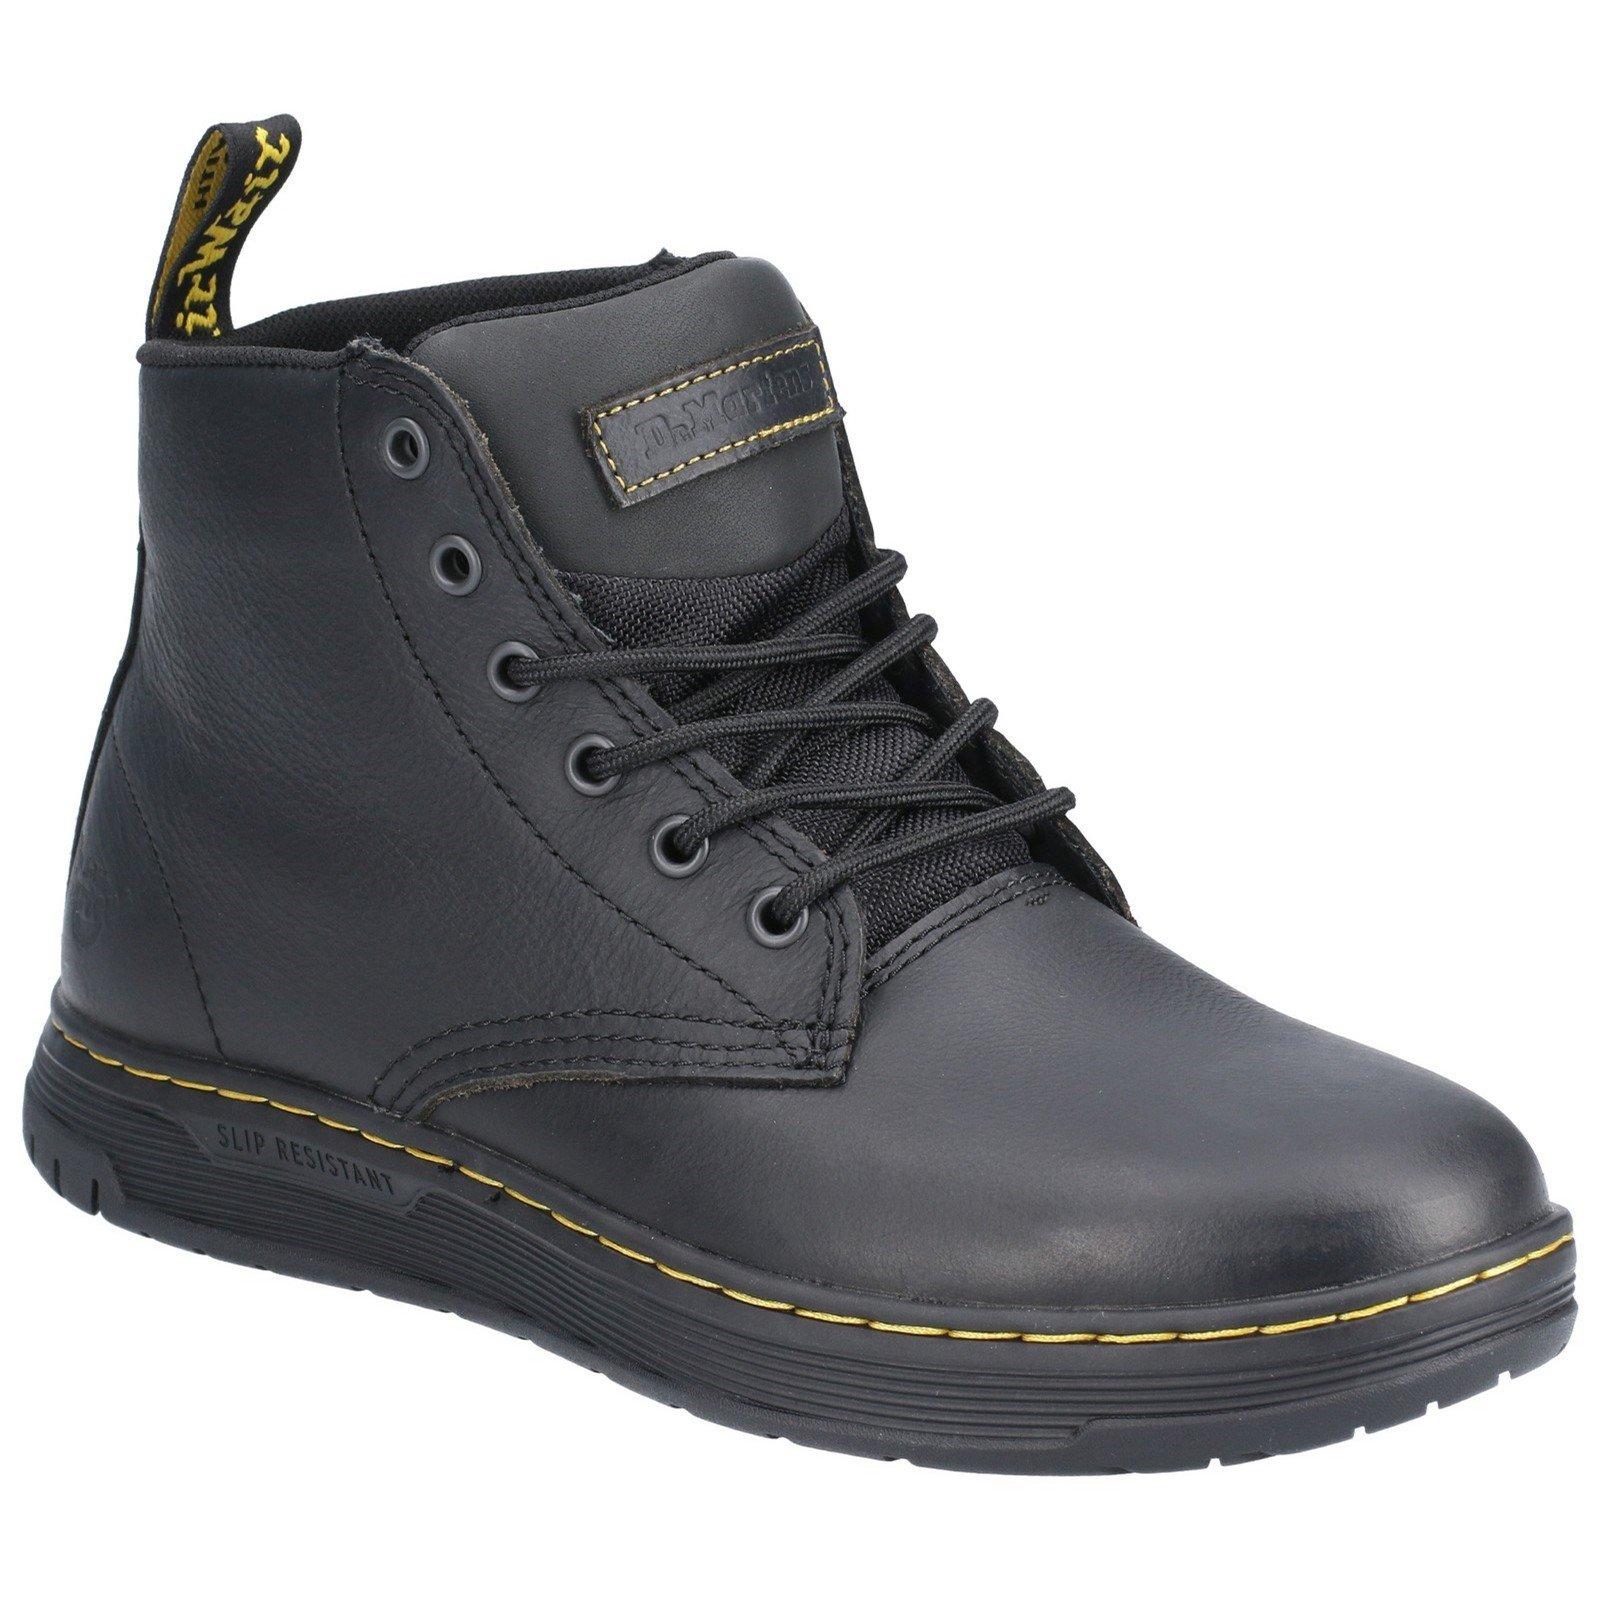 Dr Martens Men's Amwell Slip Resistant Leather Boot Black 29508 - Black 7